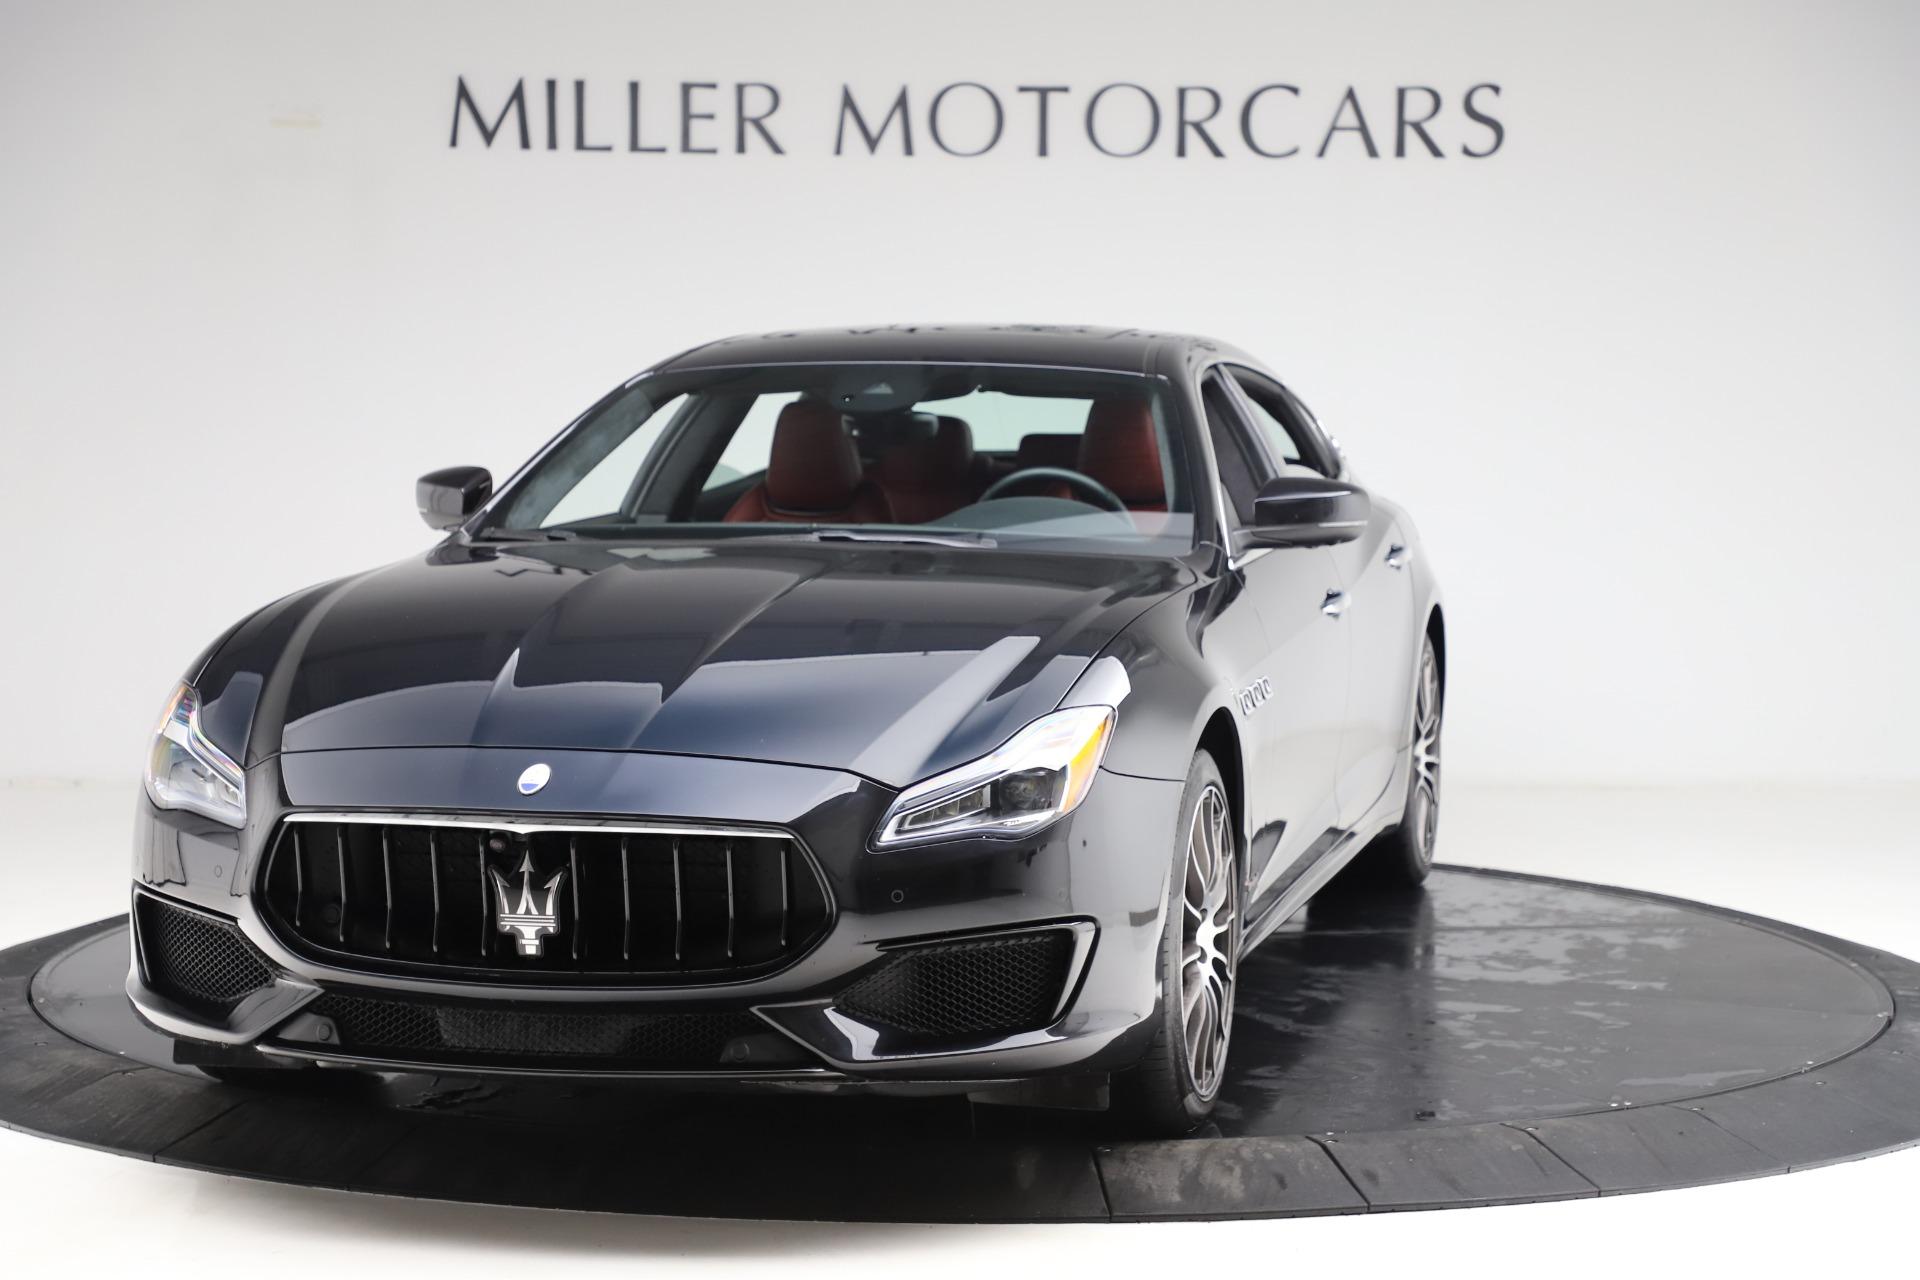 Used 2018 Maserati Quattroporte S Q4 GranSport for sale $67,900 at McLaren Greenwich in Greenwich CT 06830 1